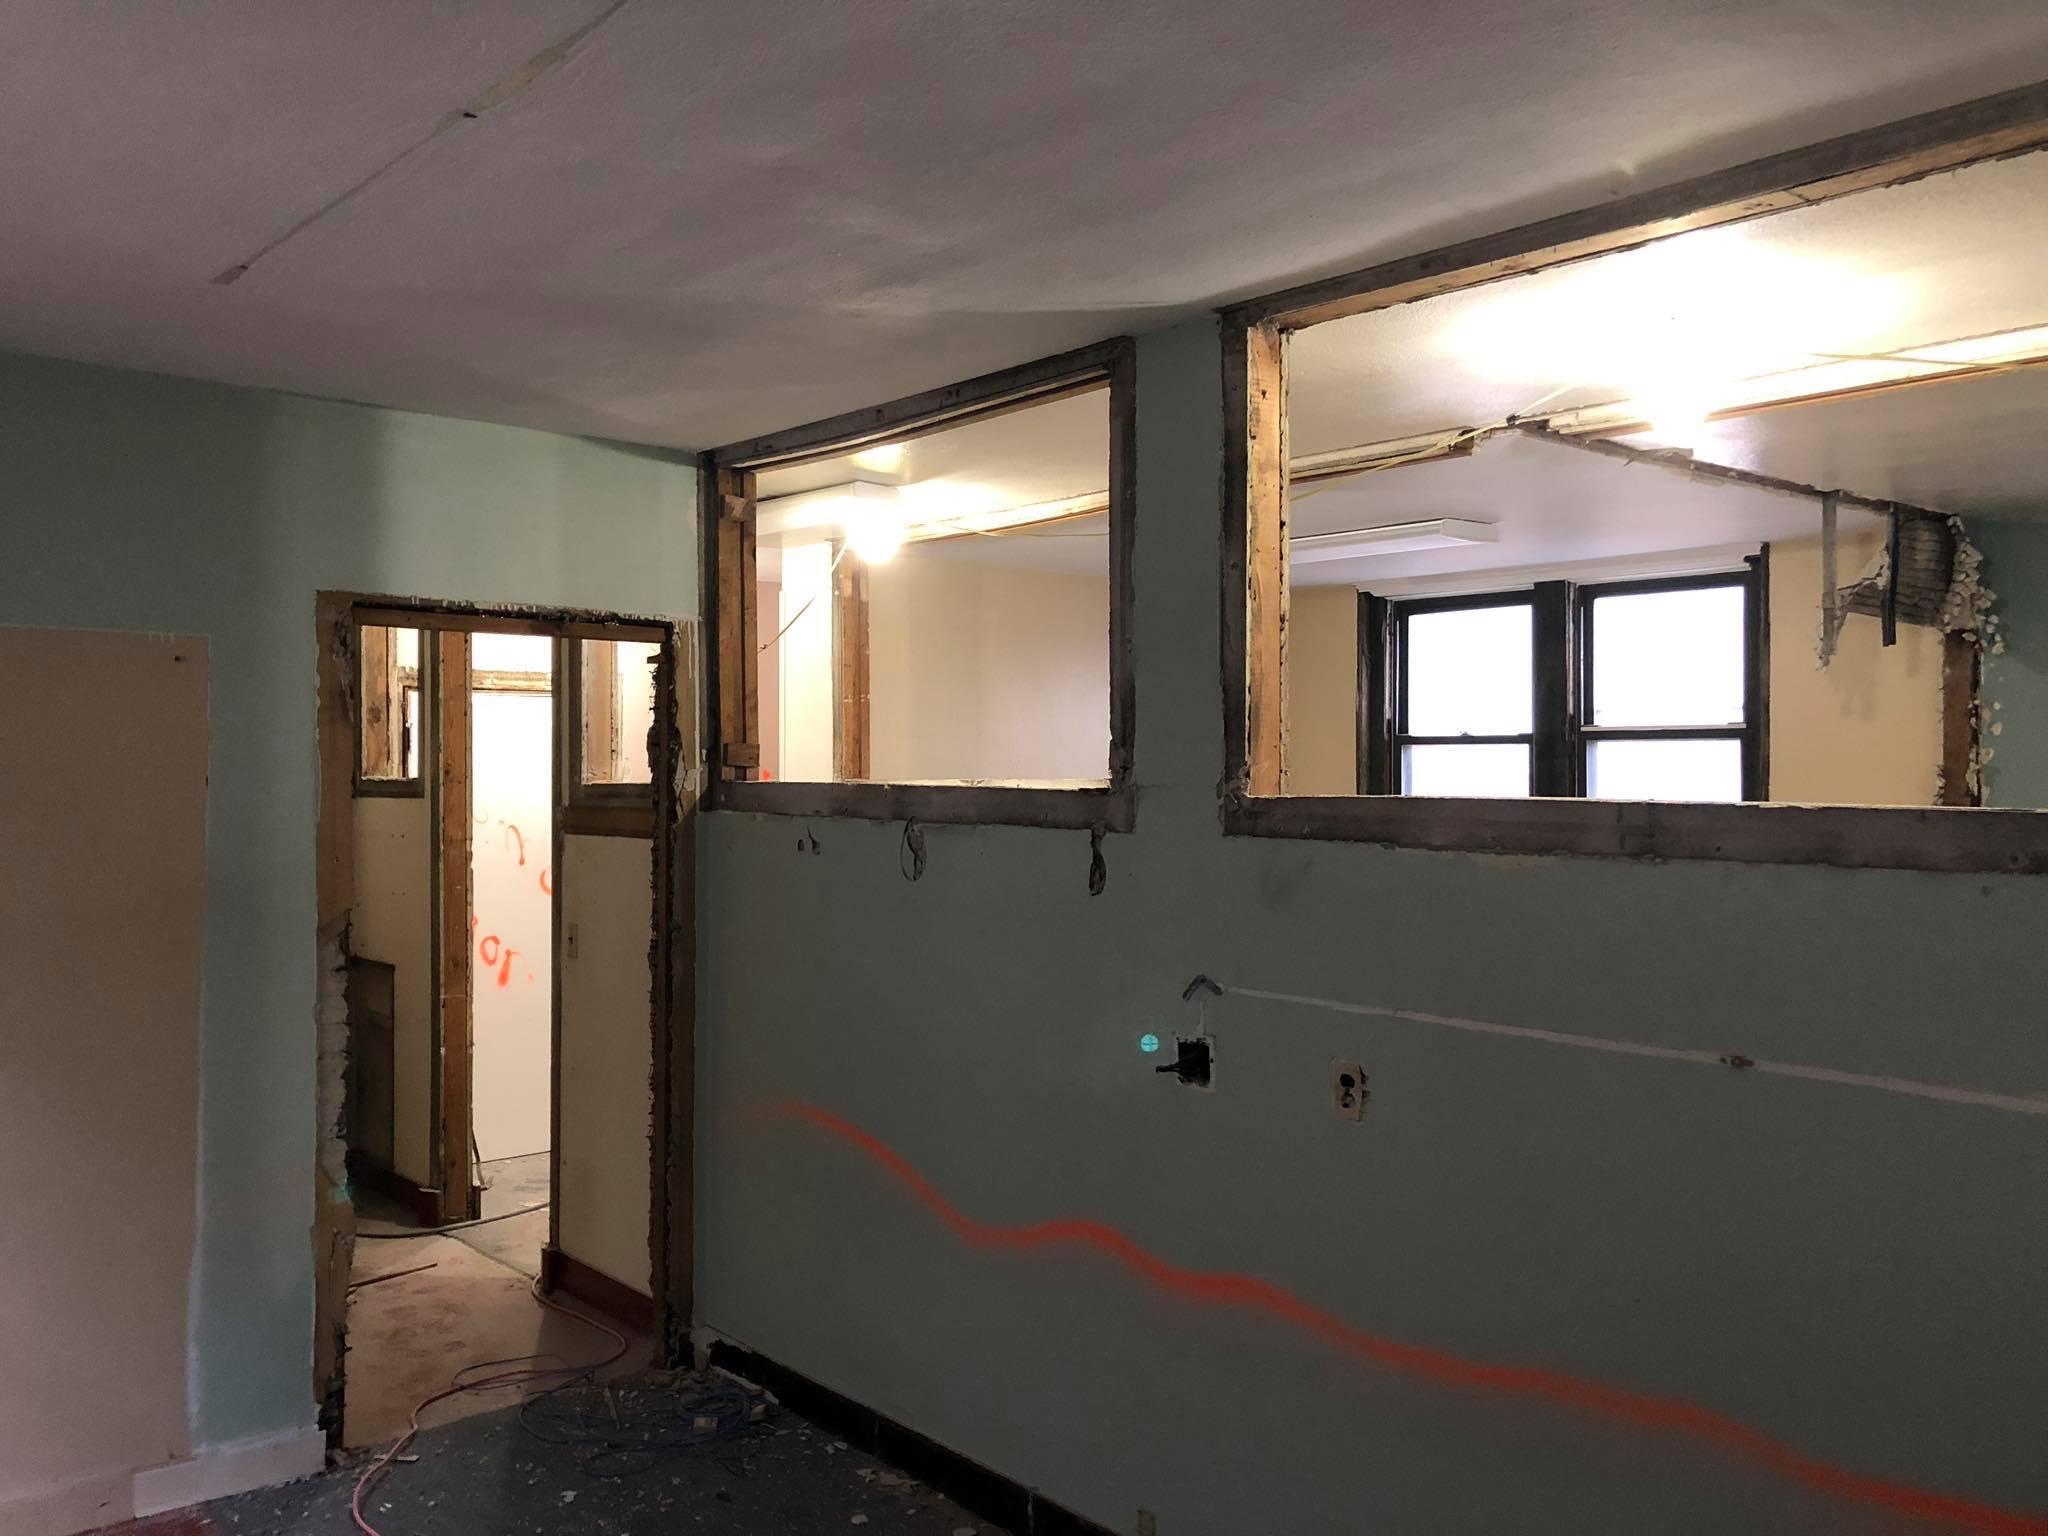 The Catechesis room, minus windows and doors.